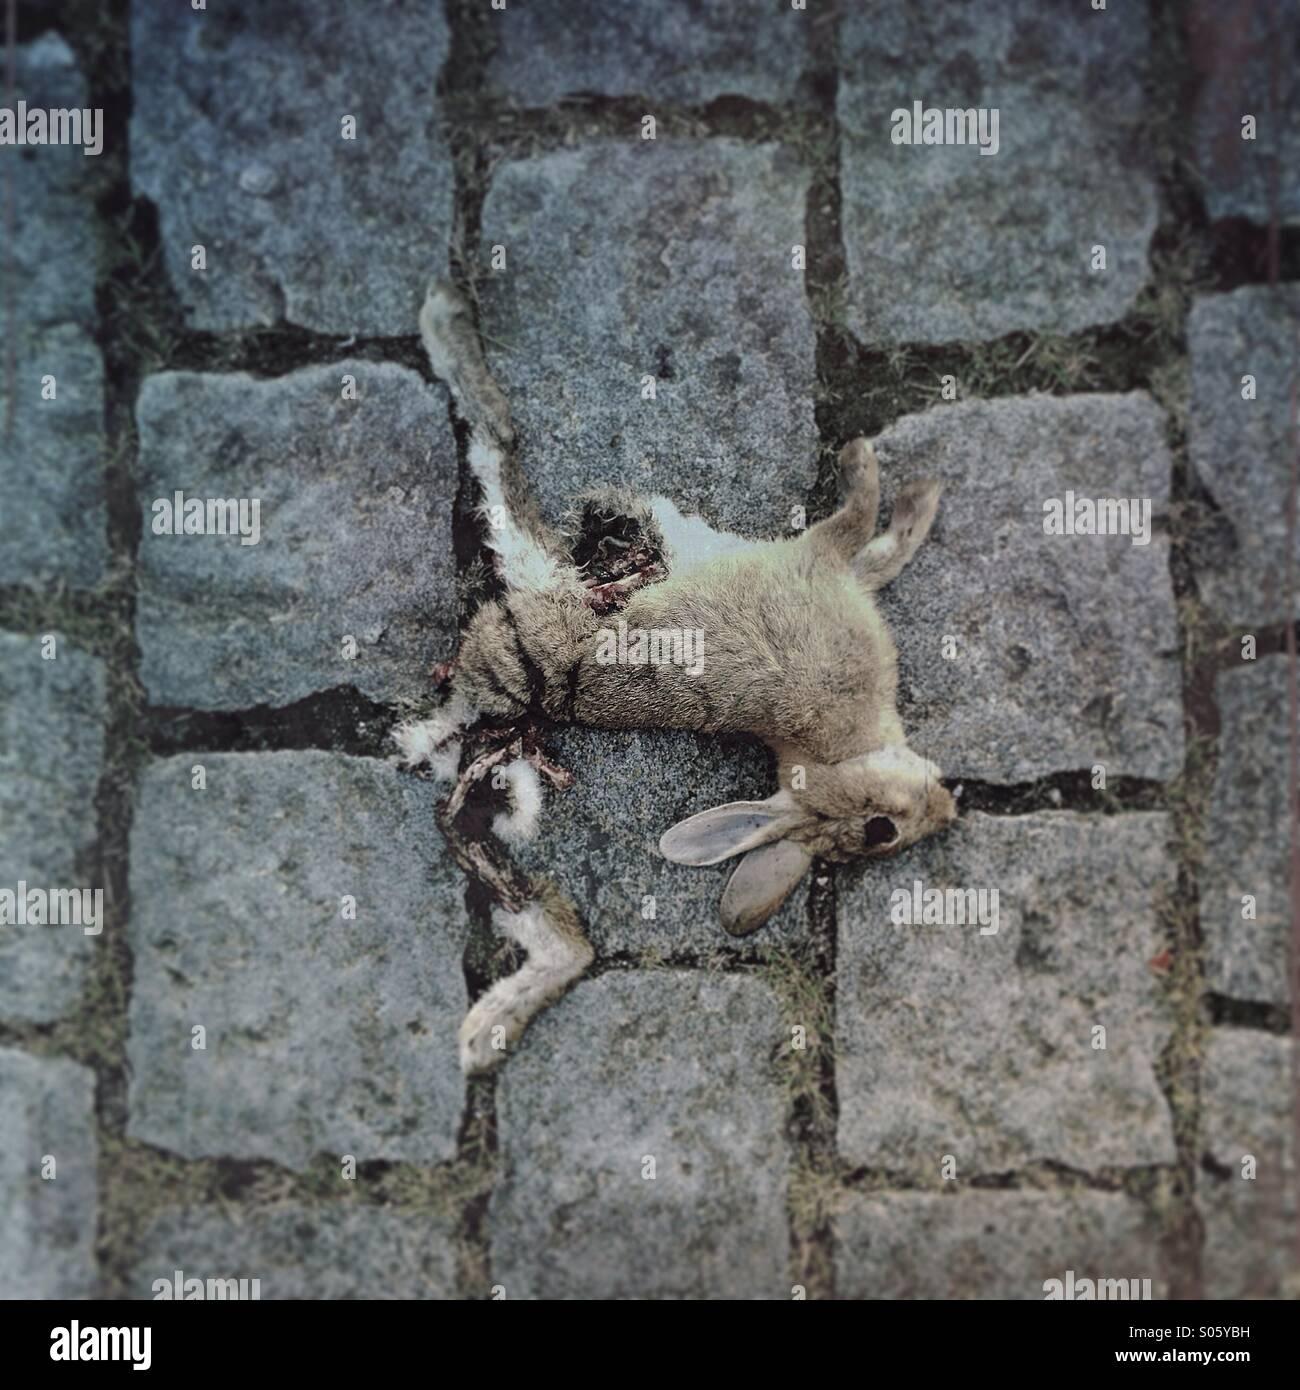 Dead rabbit, road kill on urban street. - Stock Image